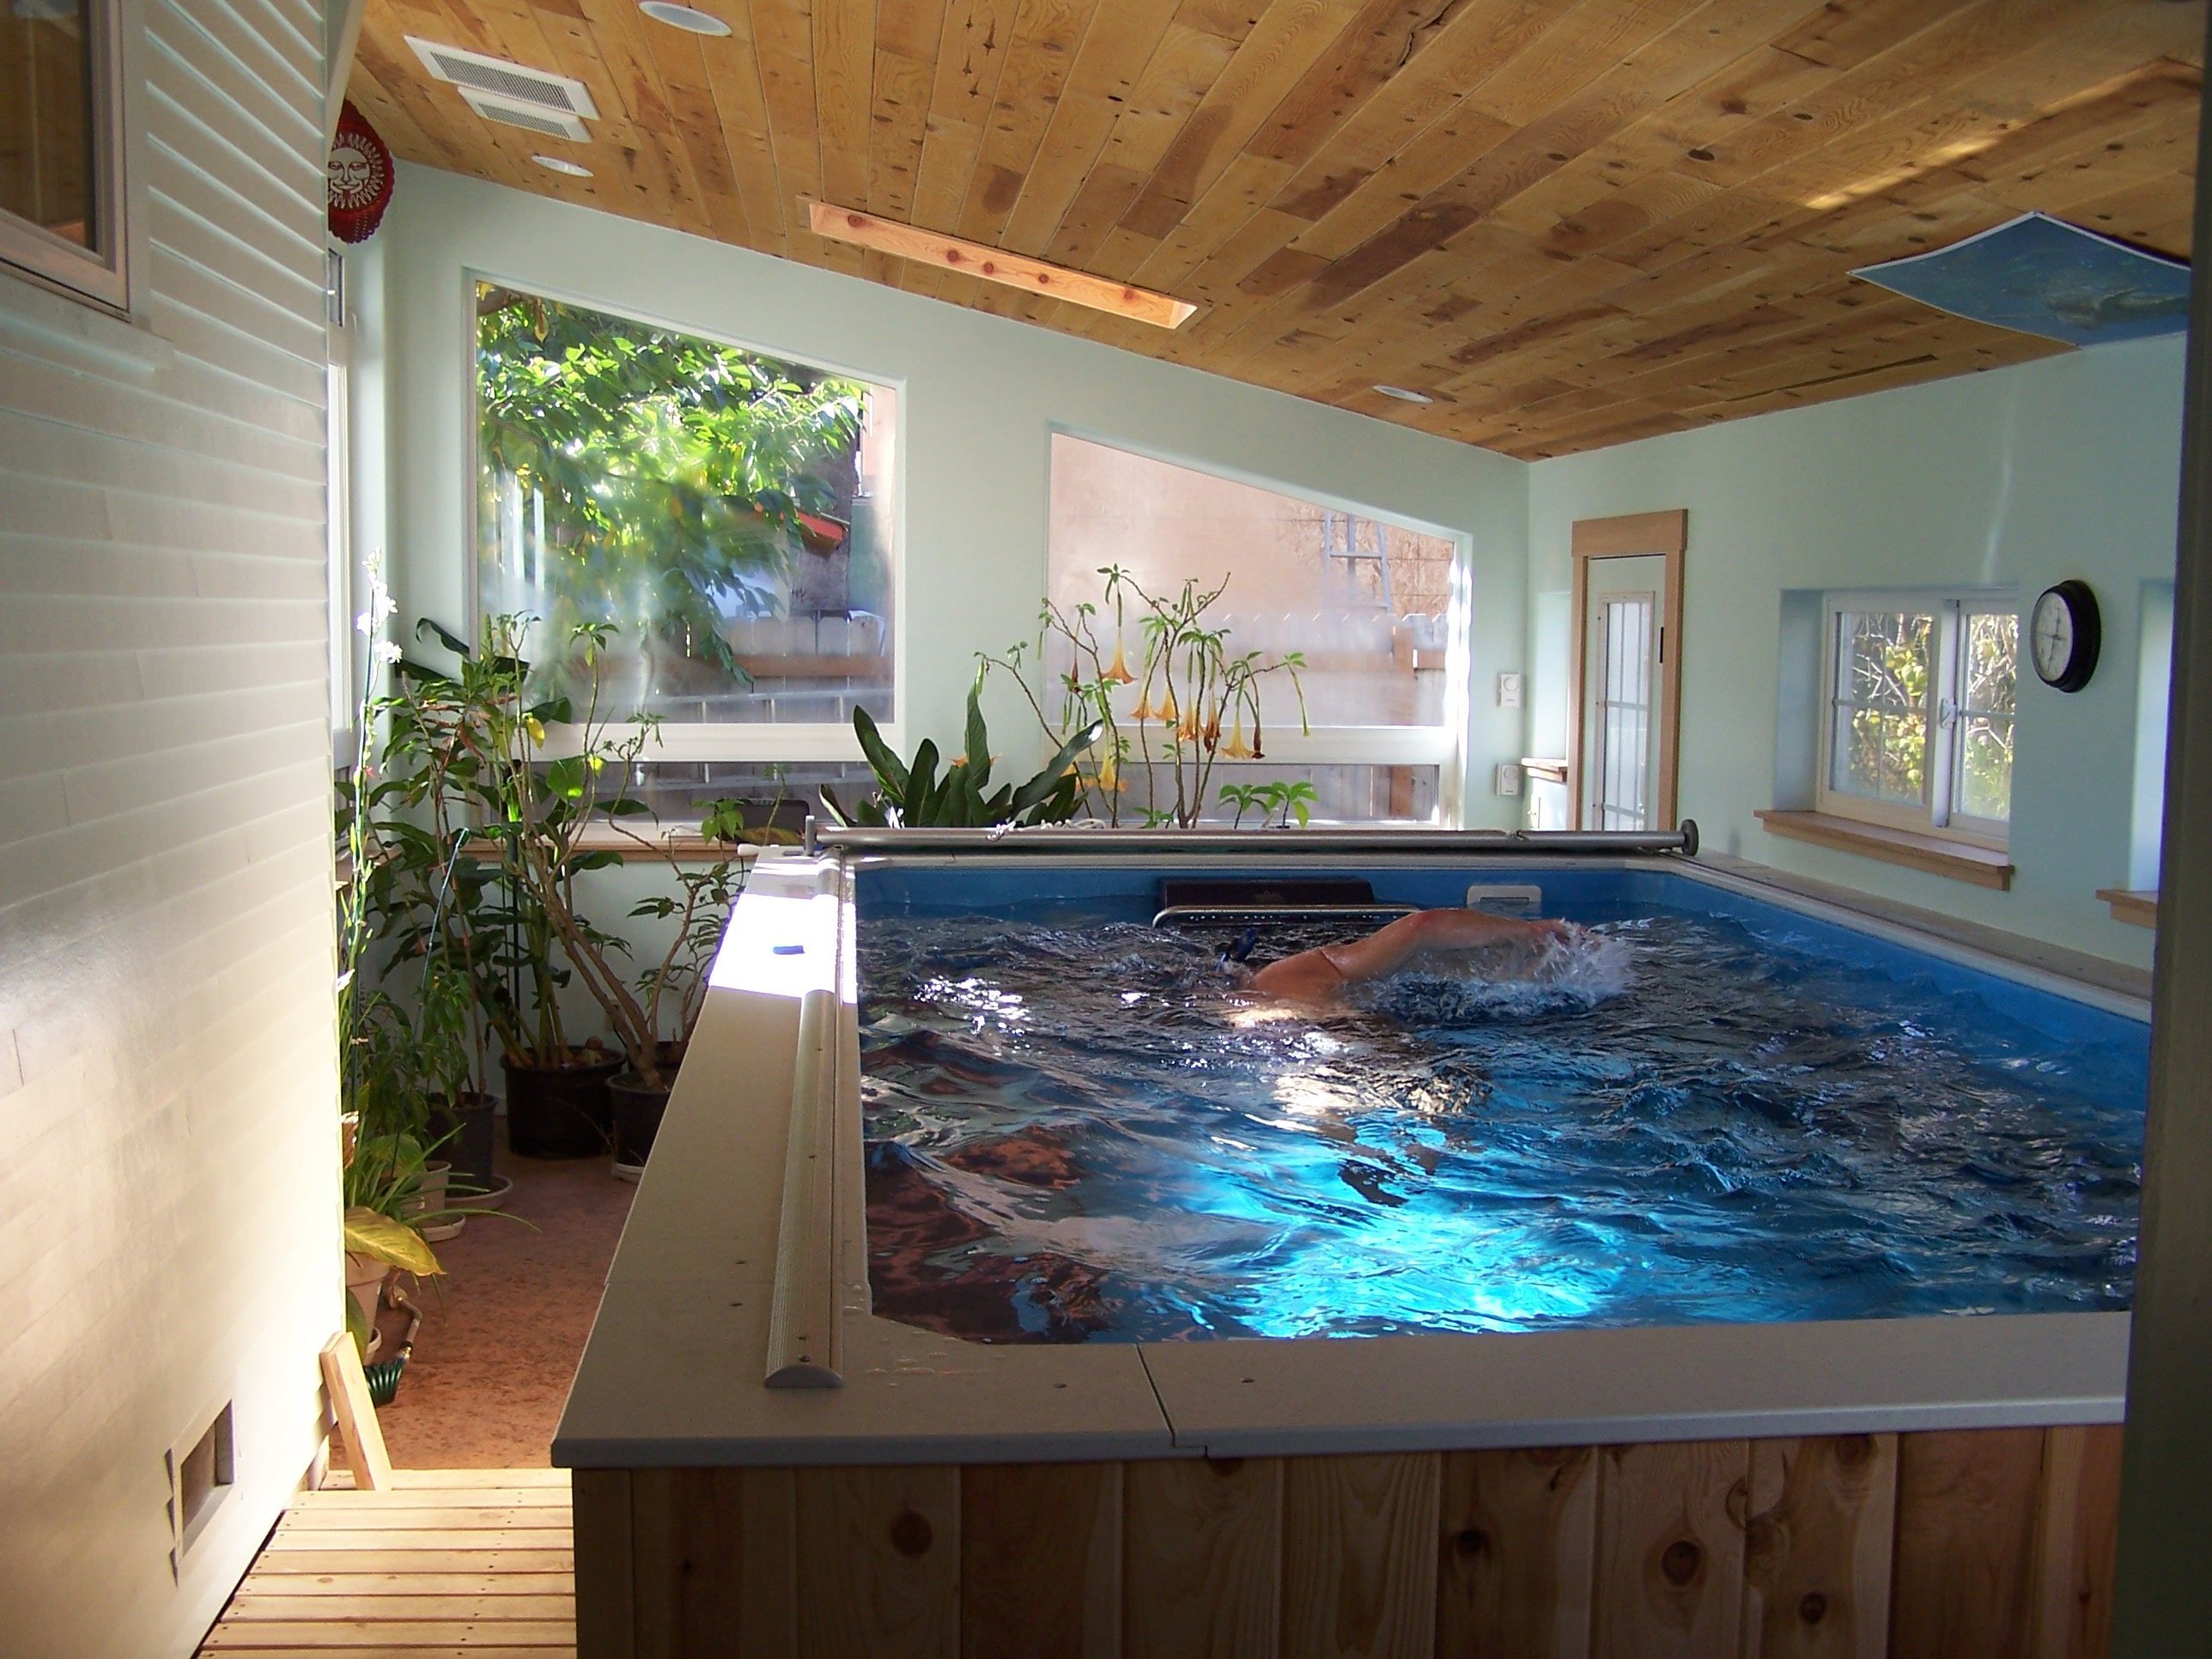 Swimming Pools Indoor Exercise Pool Endless Pool Swim Spa Indoor Pool